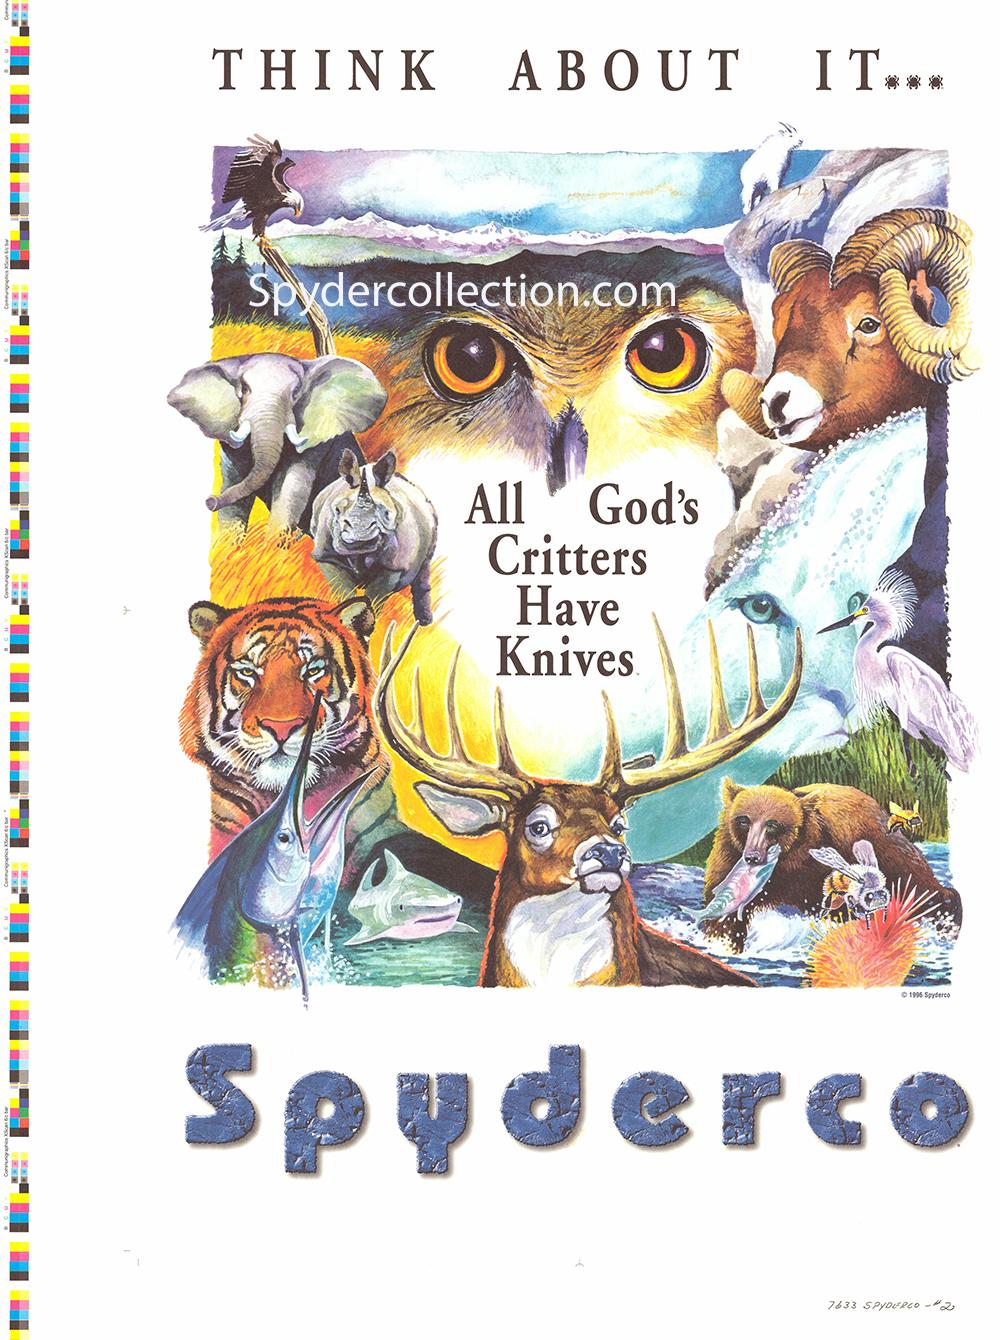 Spyderco Critters artwork